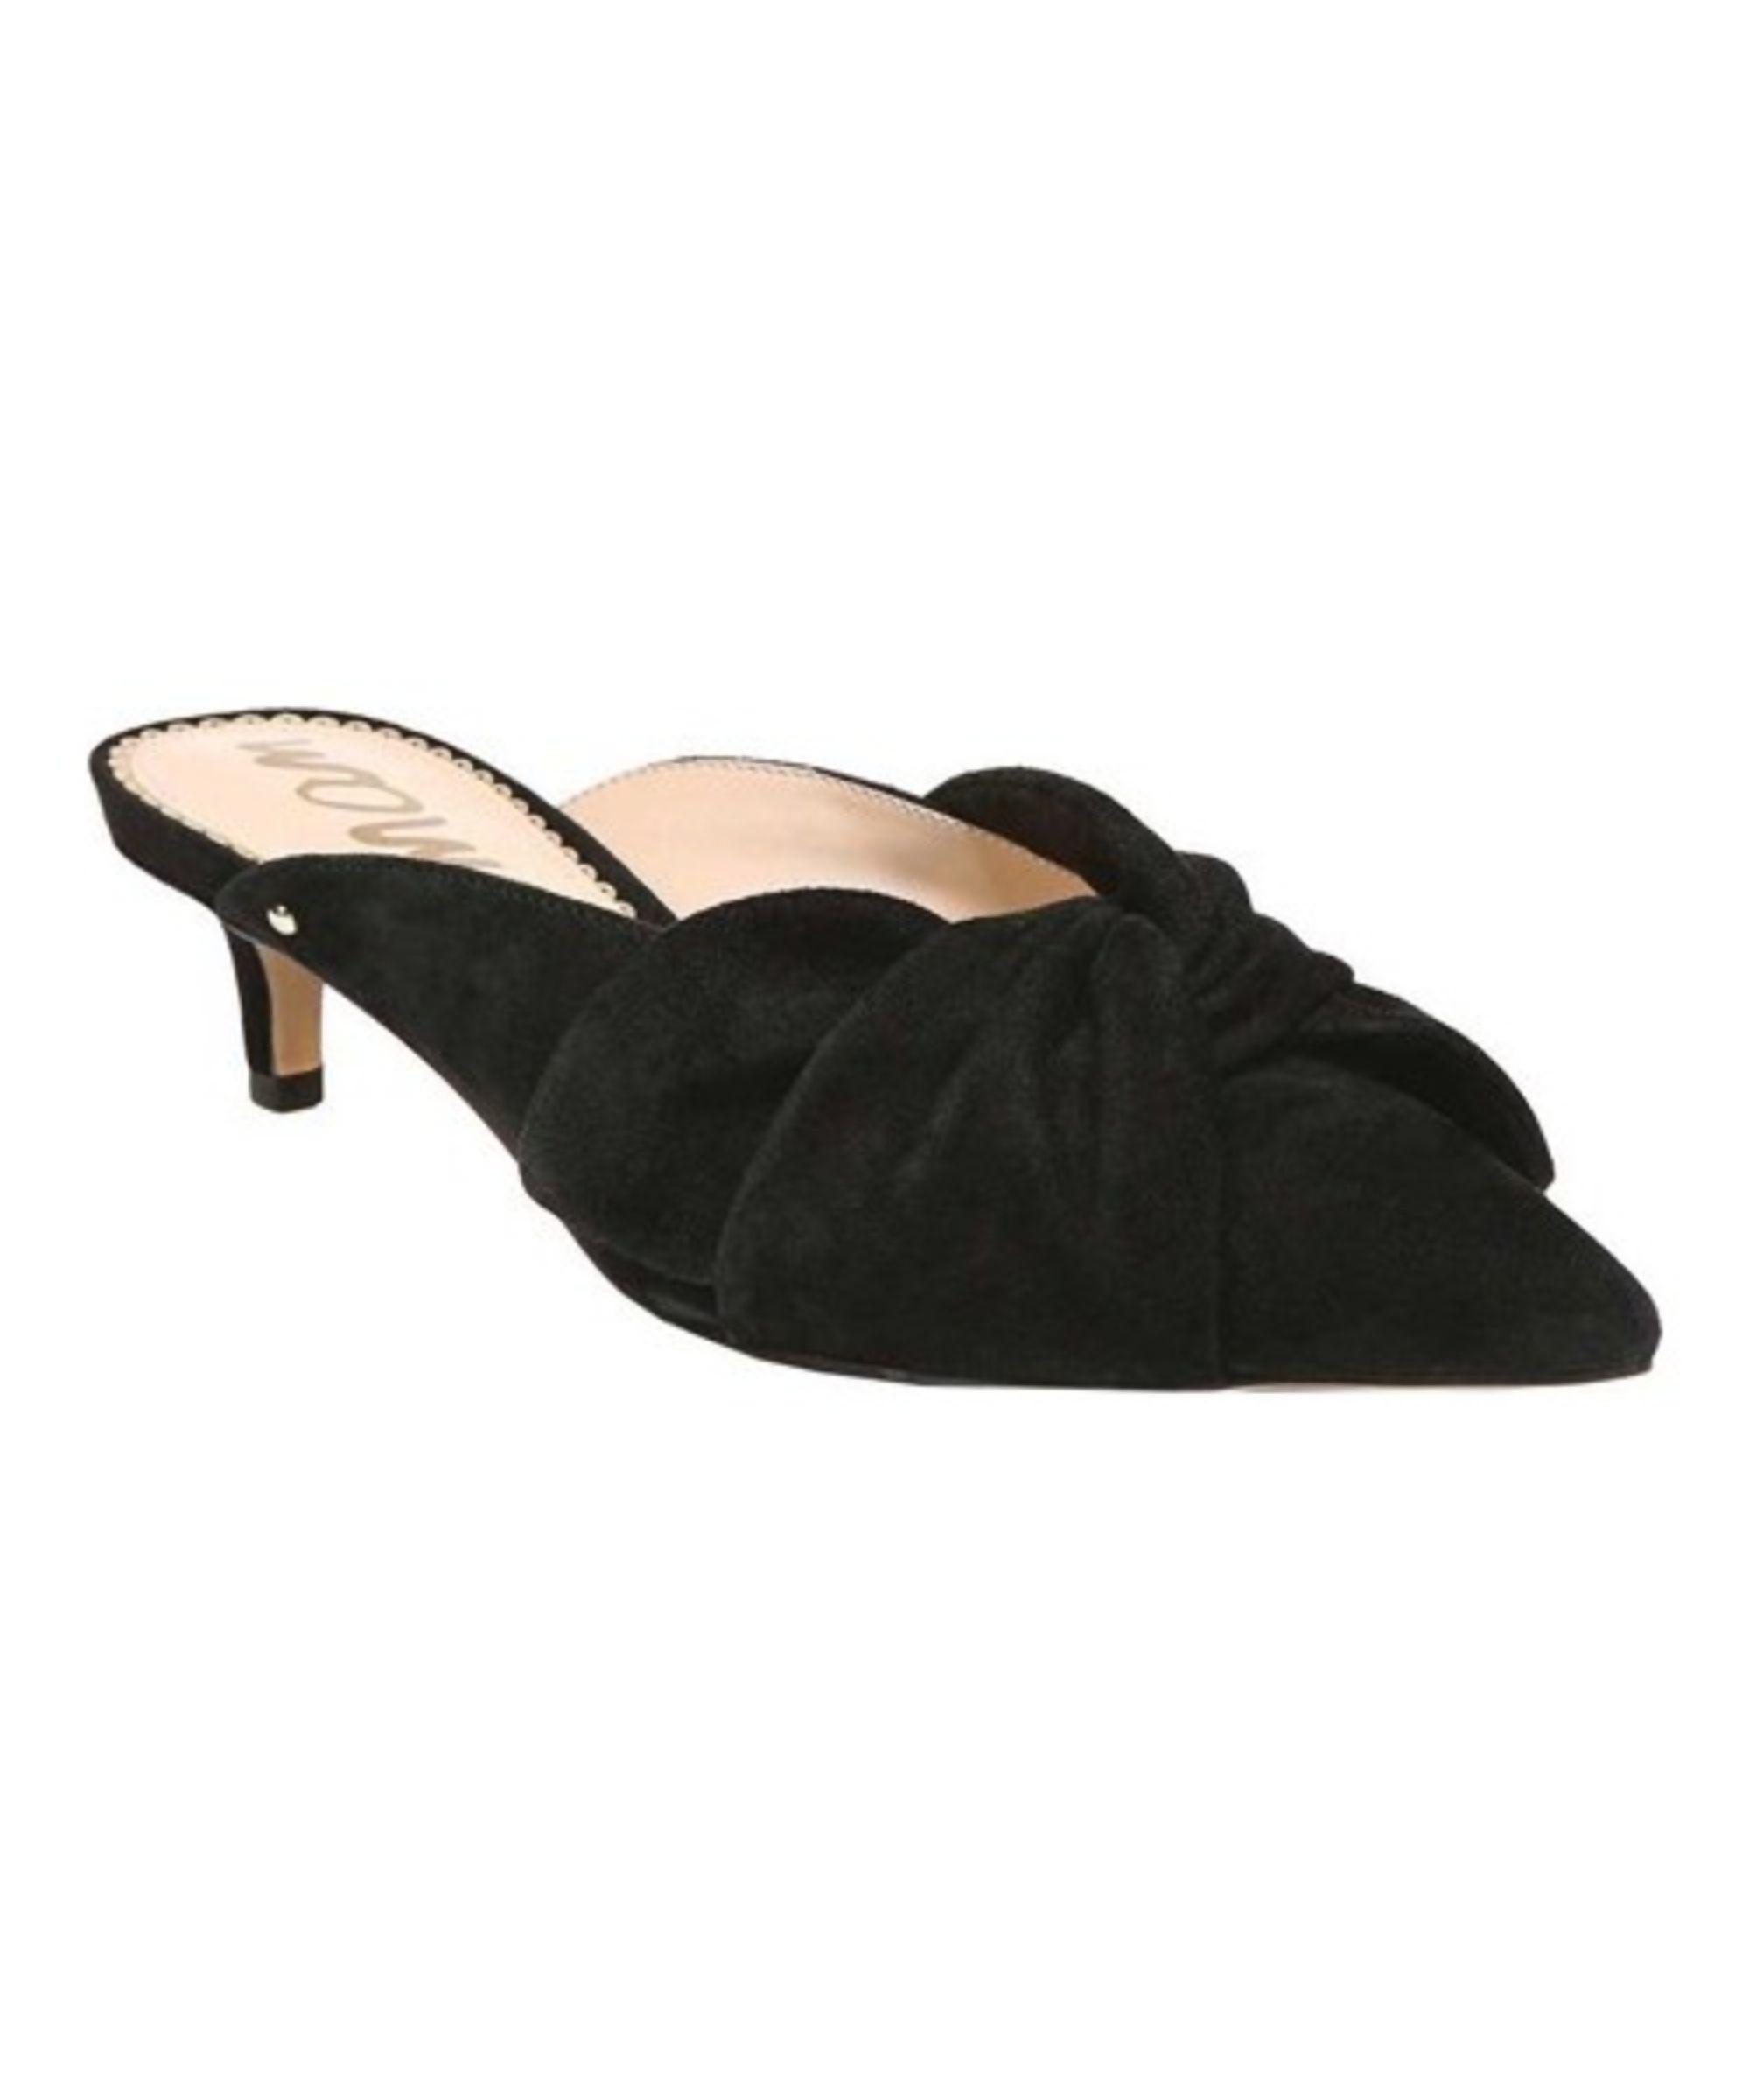 Sam Edelman Women's Laney Kitten Heel